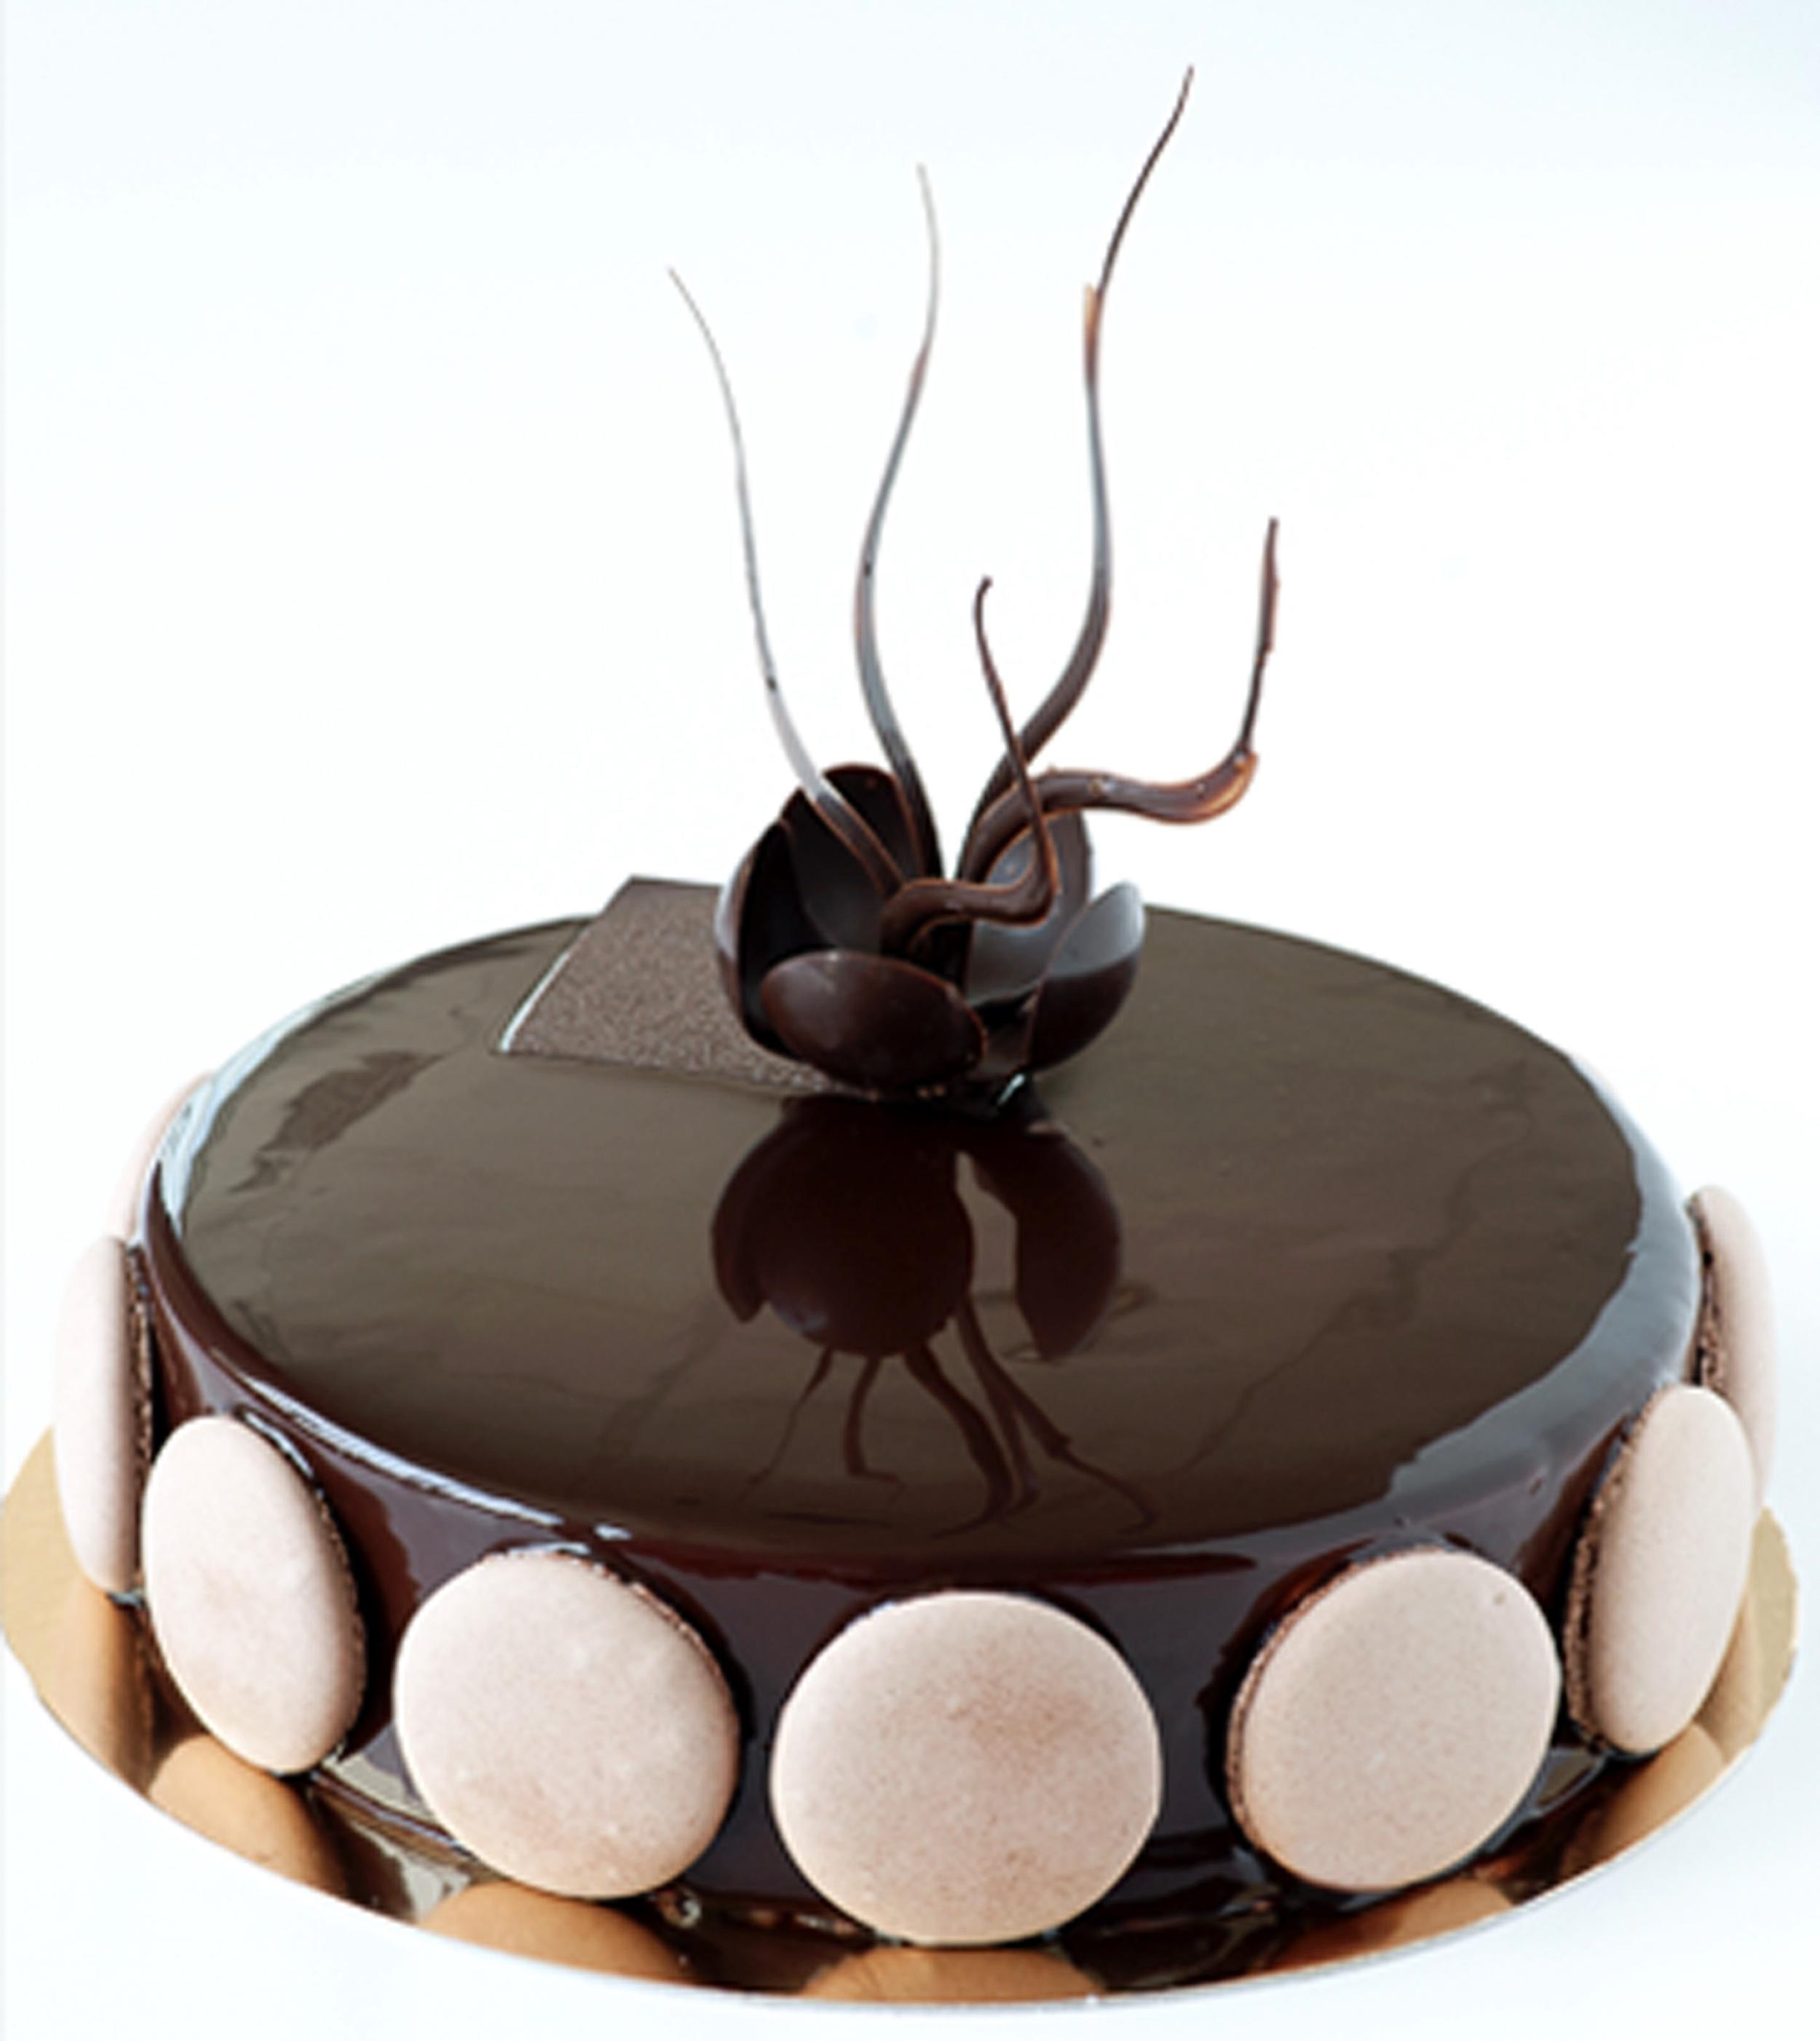 ChocolateGelatoCake_Recipes.jpg